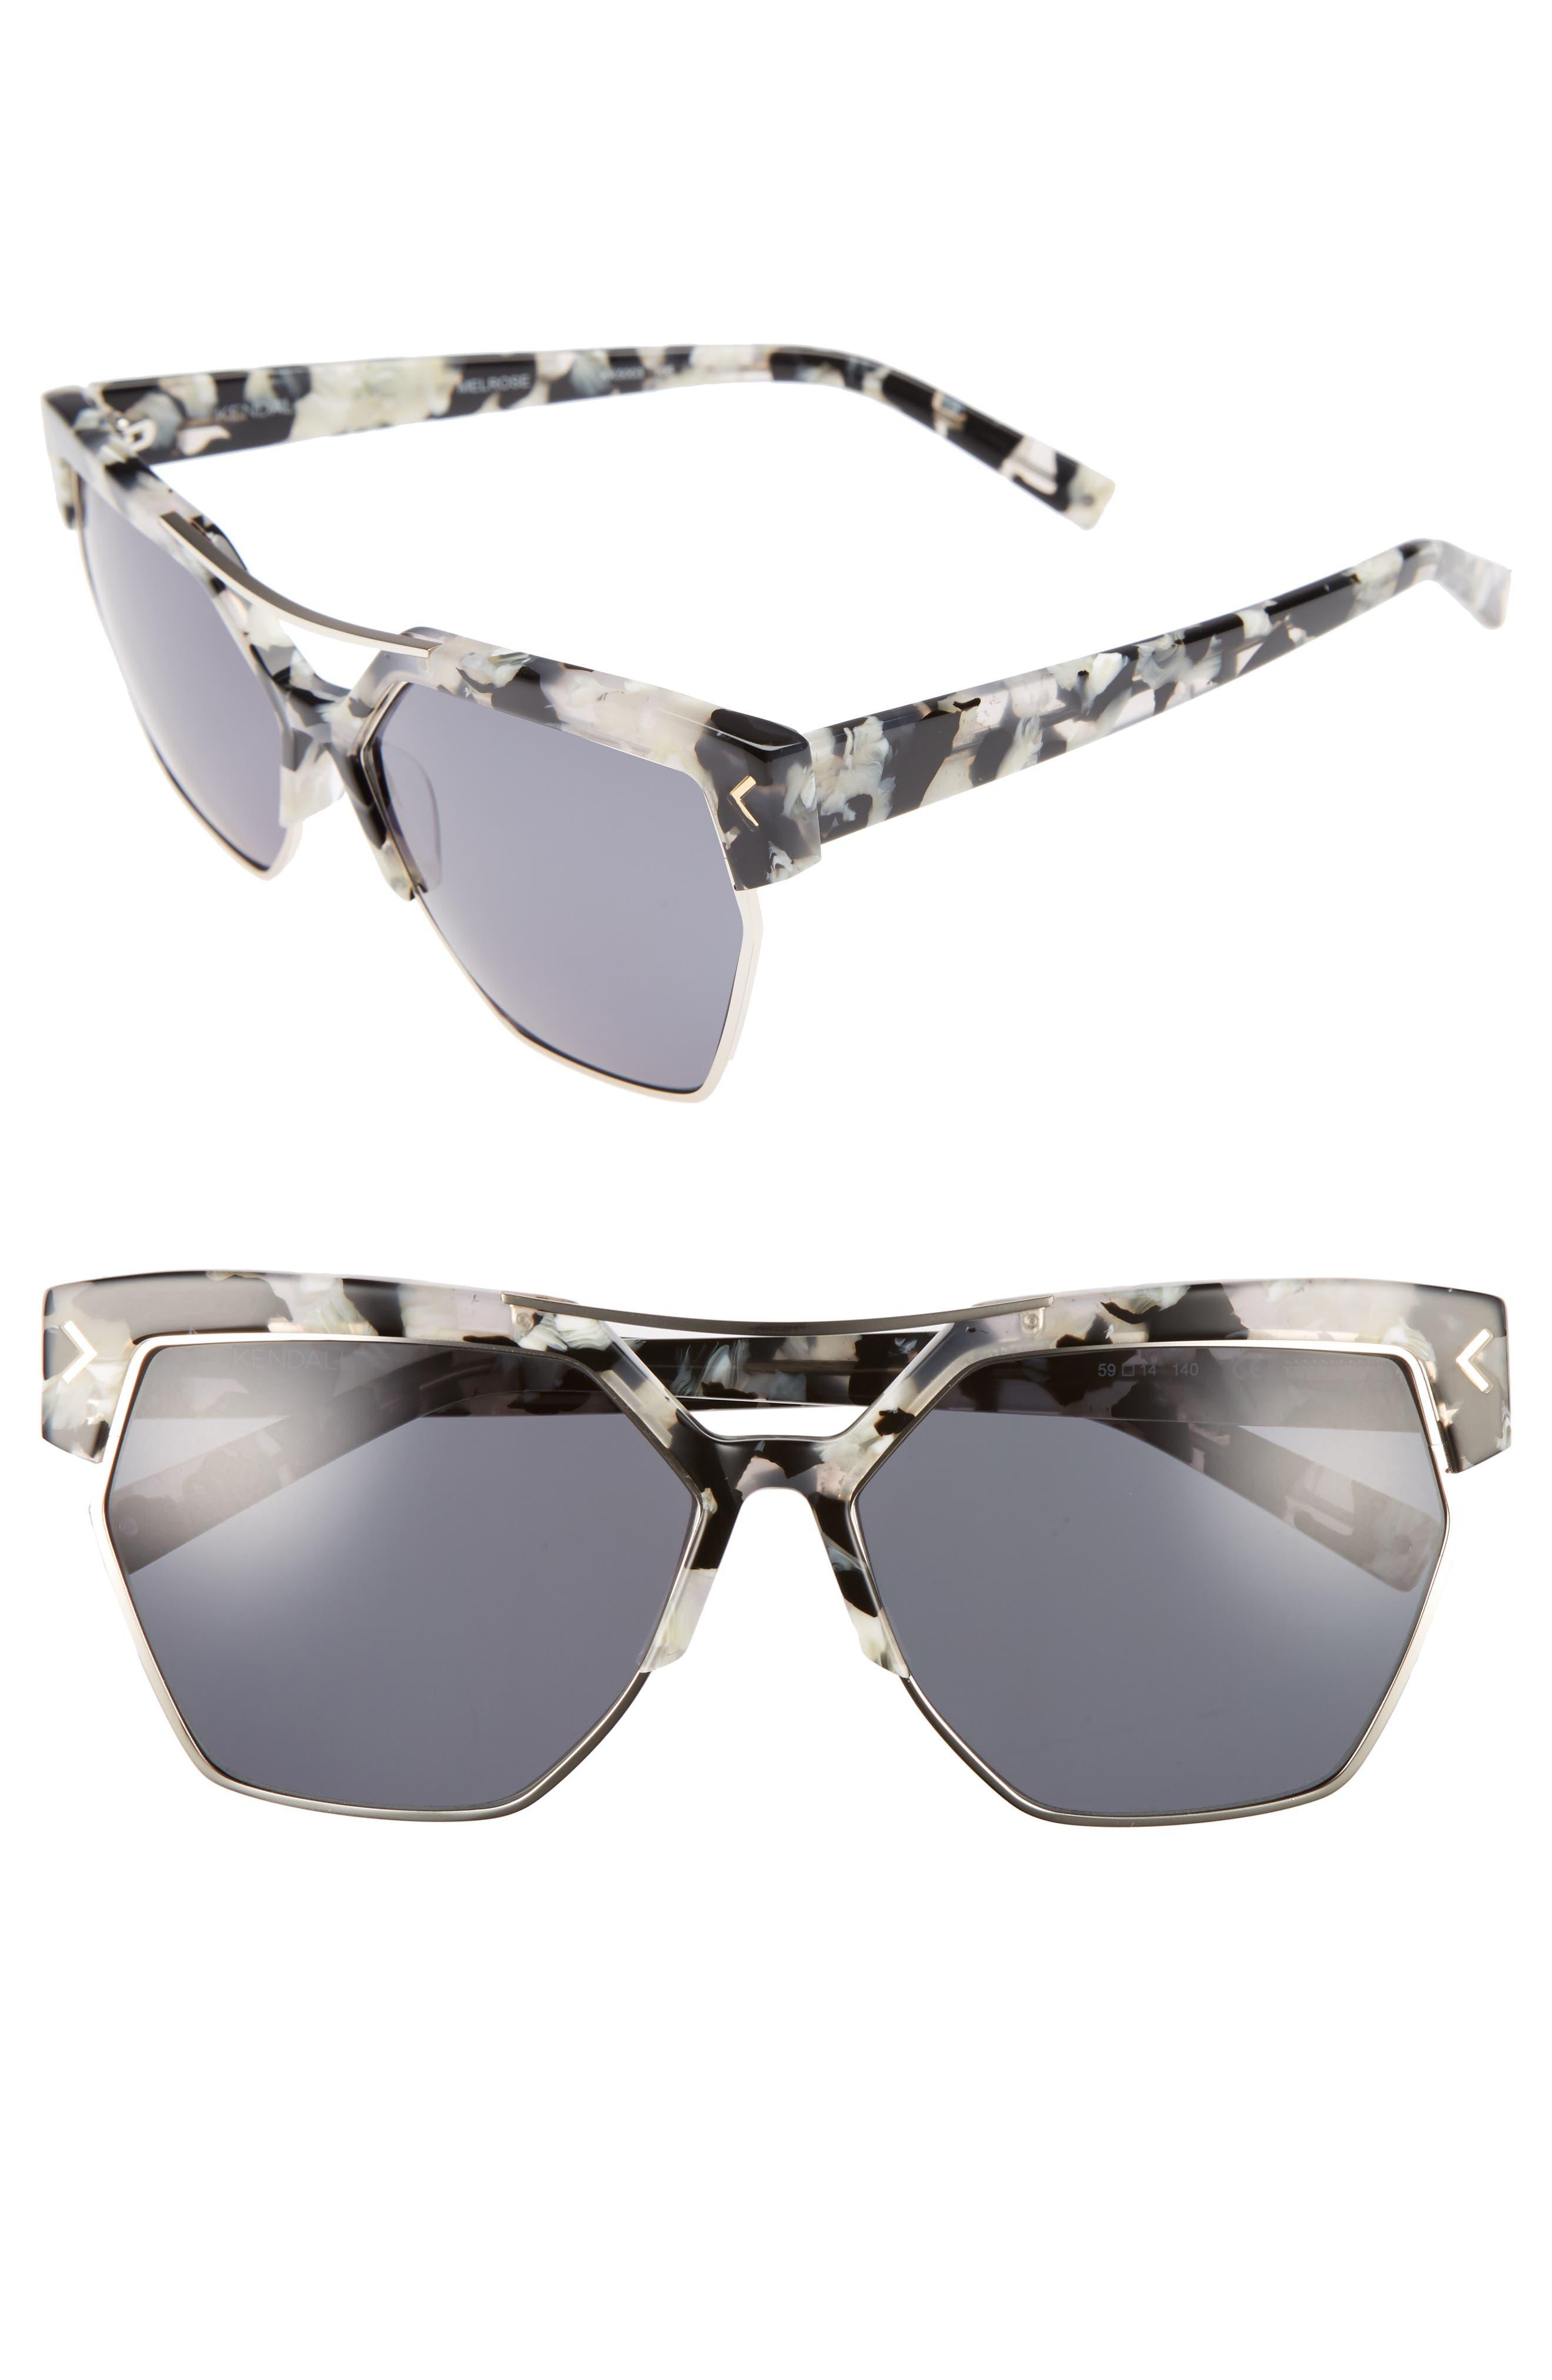 55mm Retro Sunglasses,                             Main thumbnail 1, color,